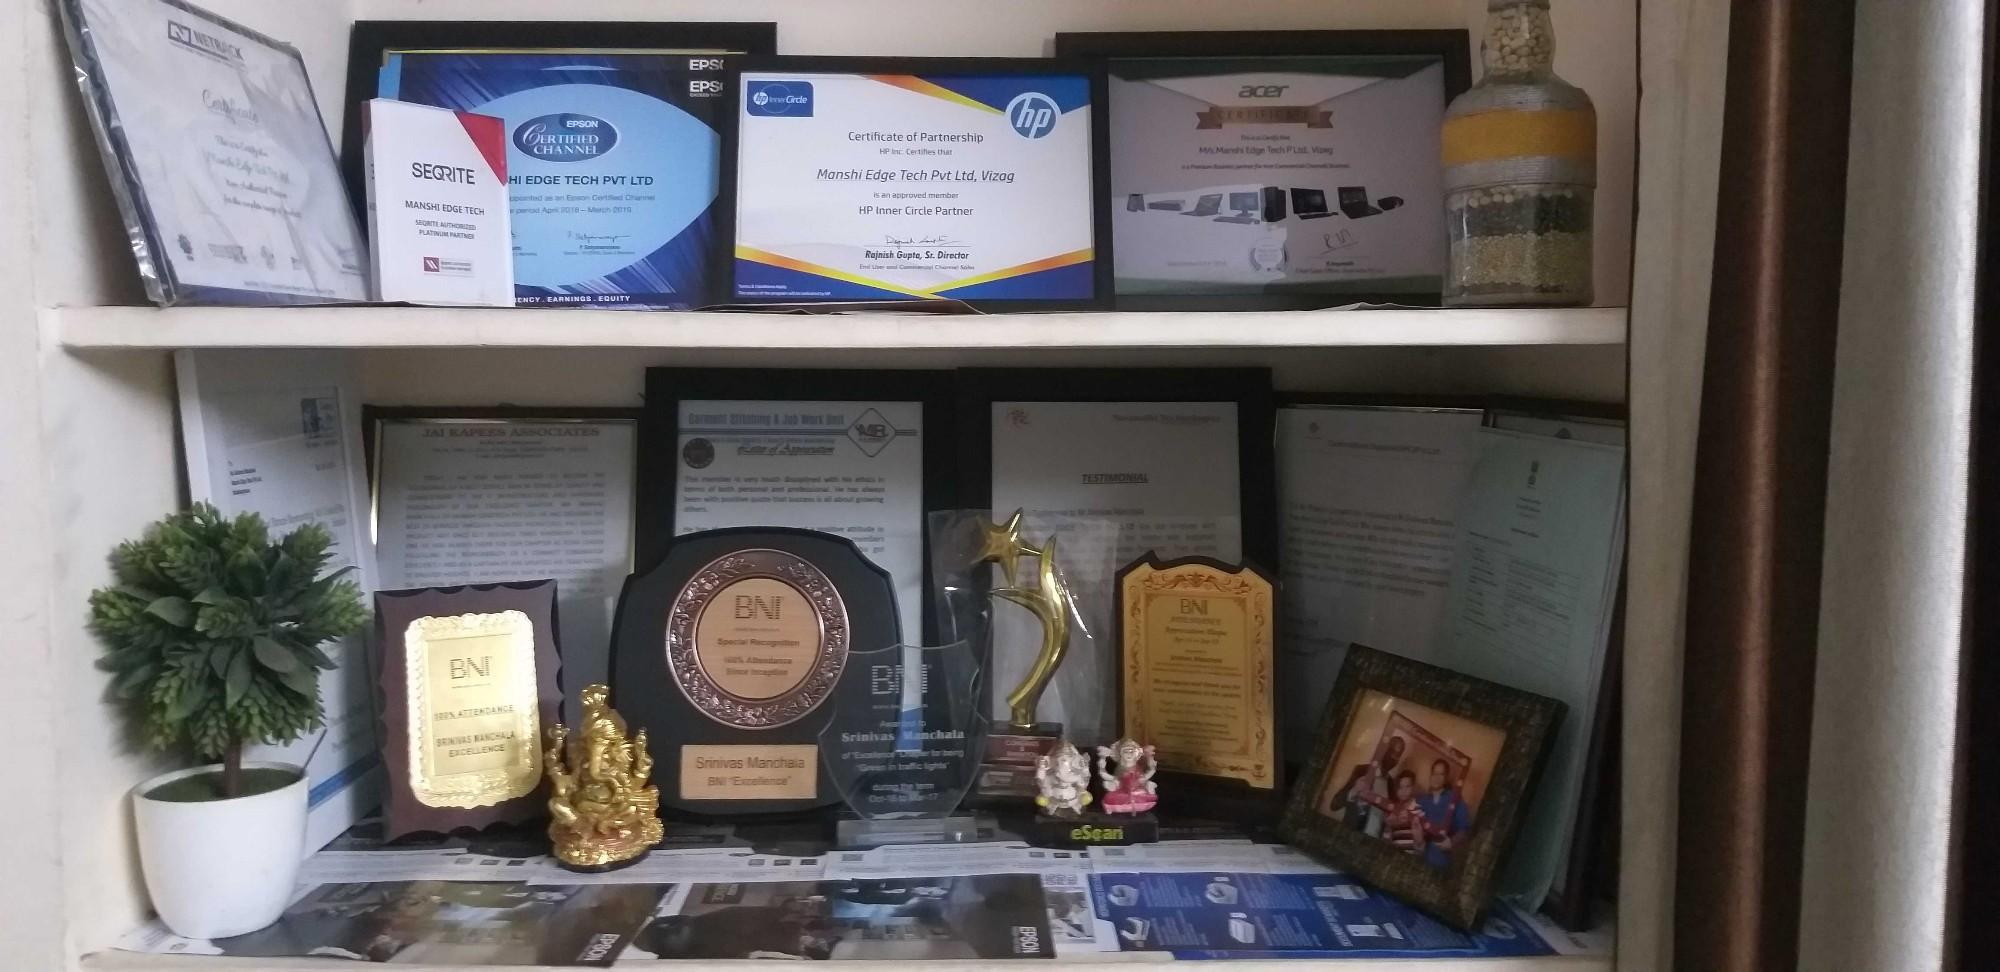 Manshi Edge Tech Pvt  Ltd  in Railway New Colony, Visakhapatnam